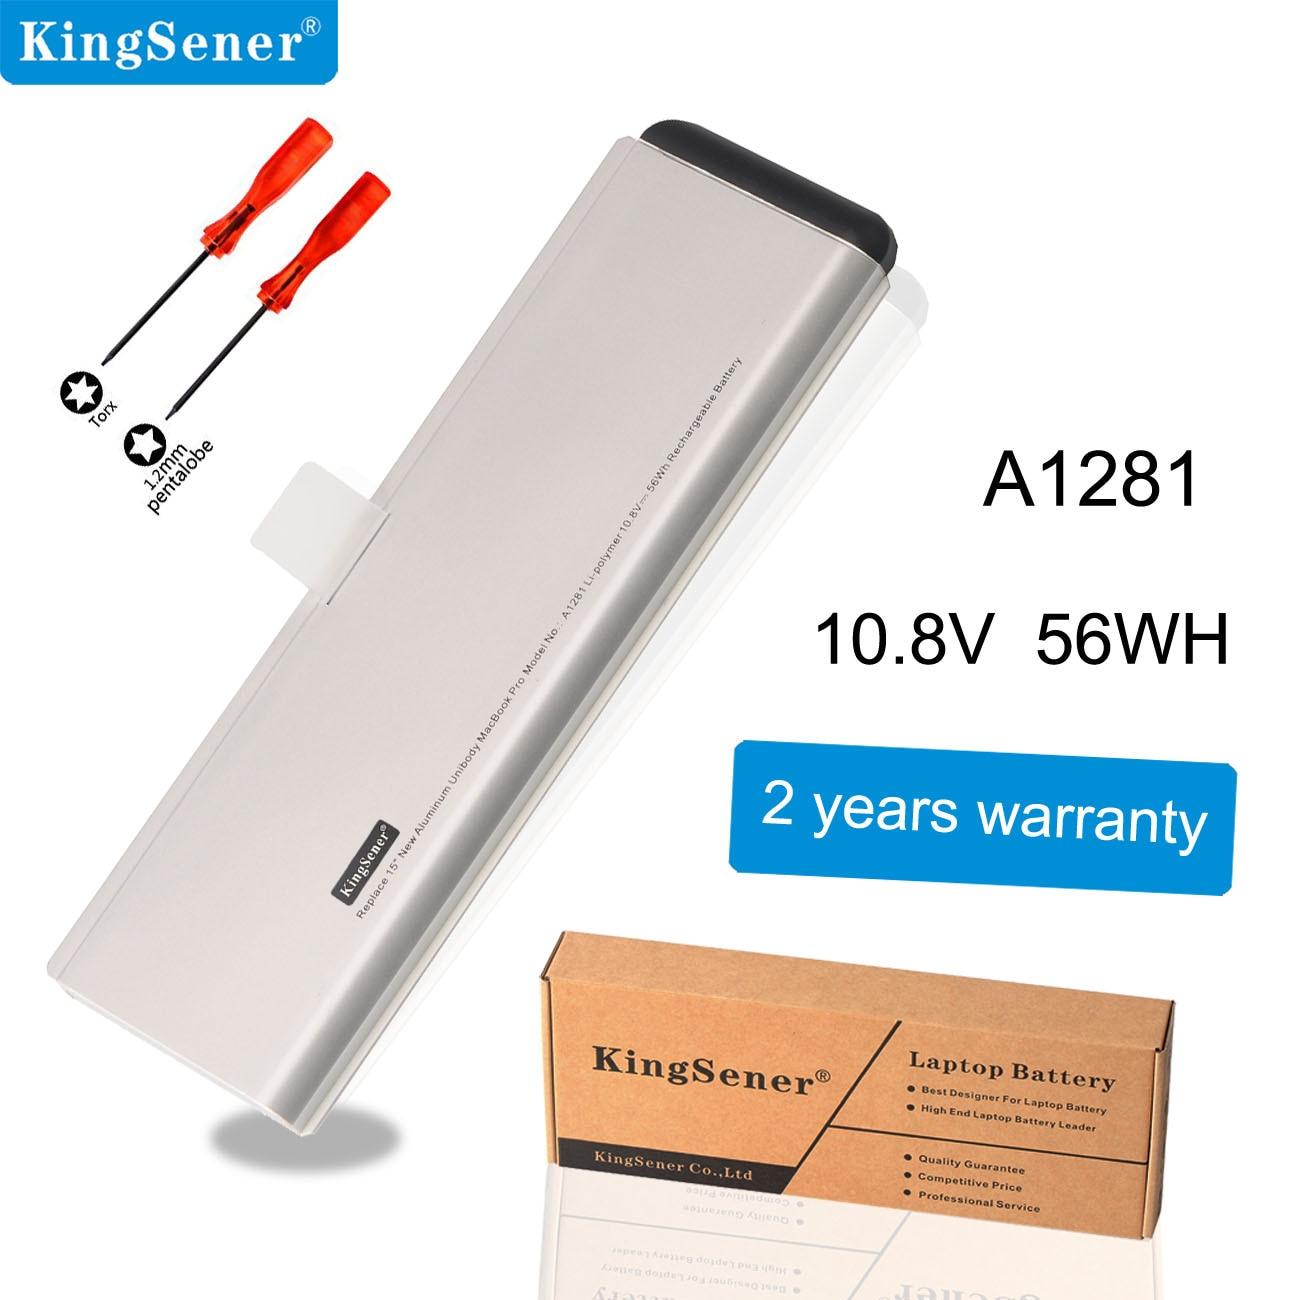 KingSener A1281 A1286 New Battery For Apple MacBook Pro 15'' (2008 Version) MB470LL/A MB471LL/A MB772 MB772LL/A 10.8V 56WH